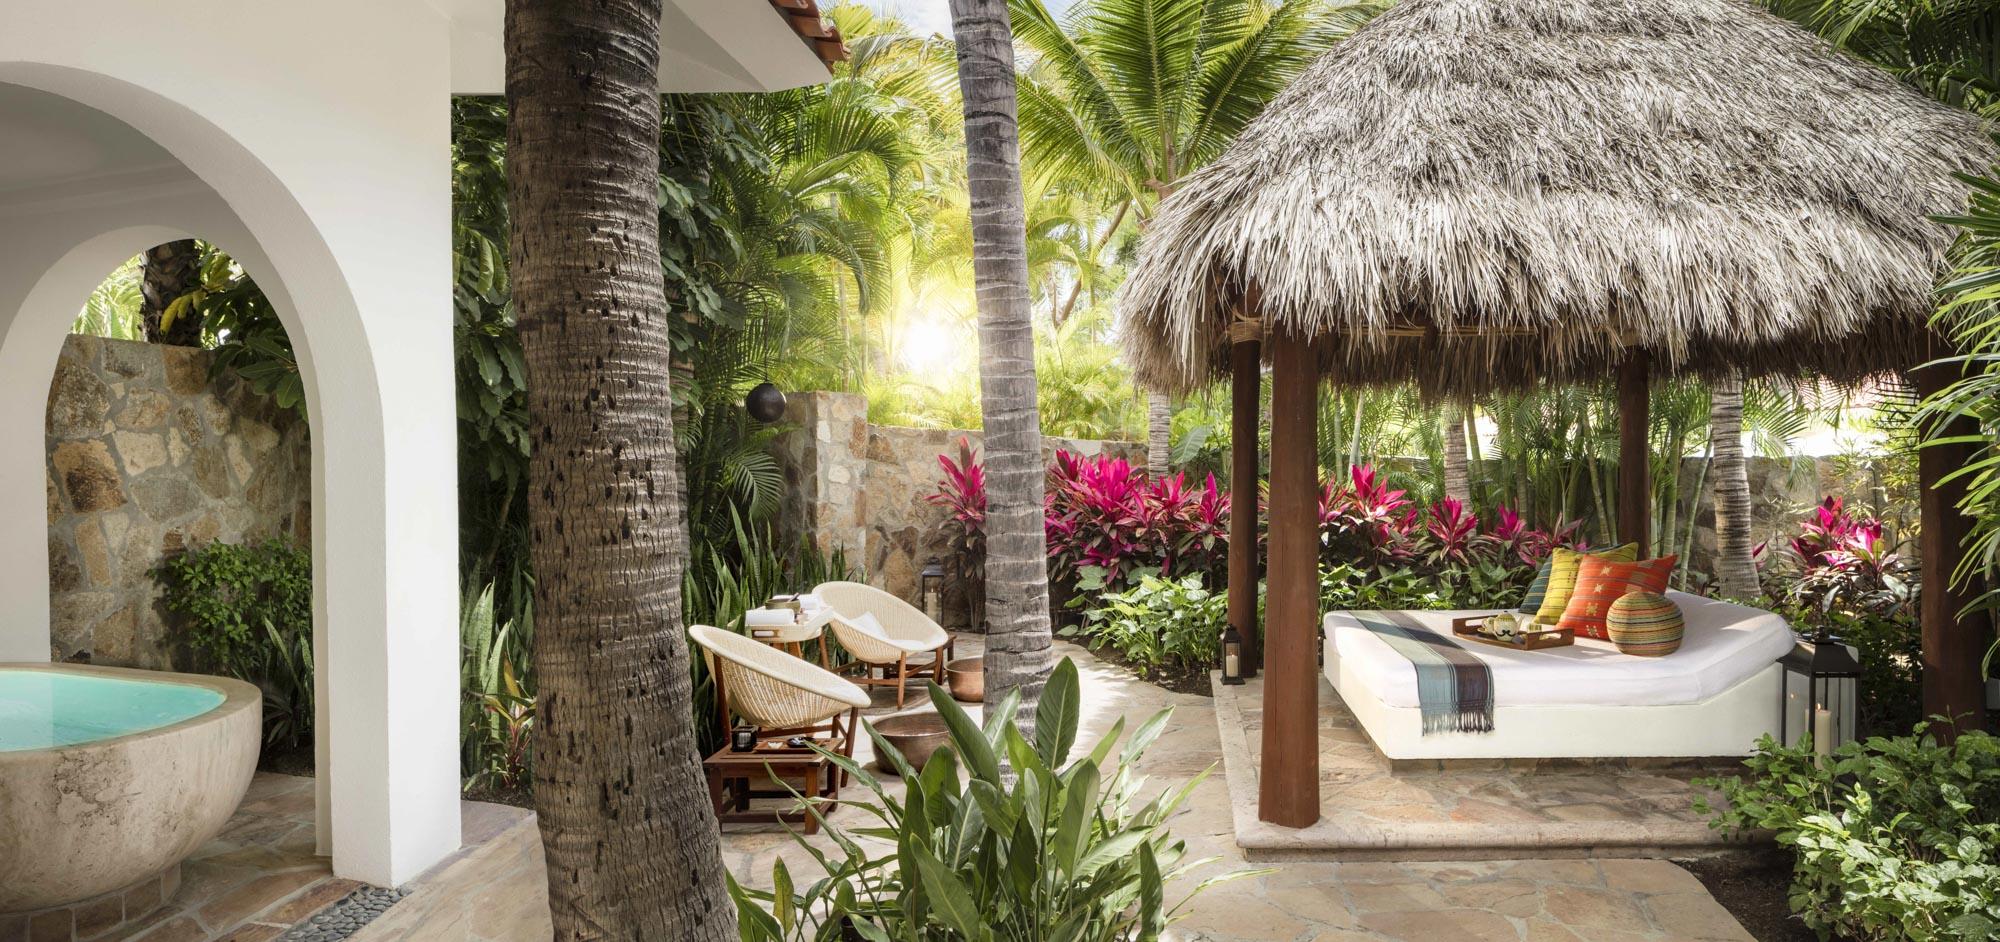 Spa & Wellness oneandonly-palmilla-wellness-spa-gardens-mr-2